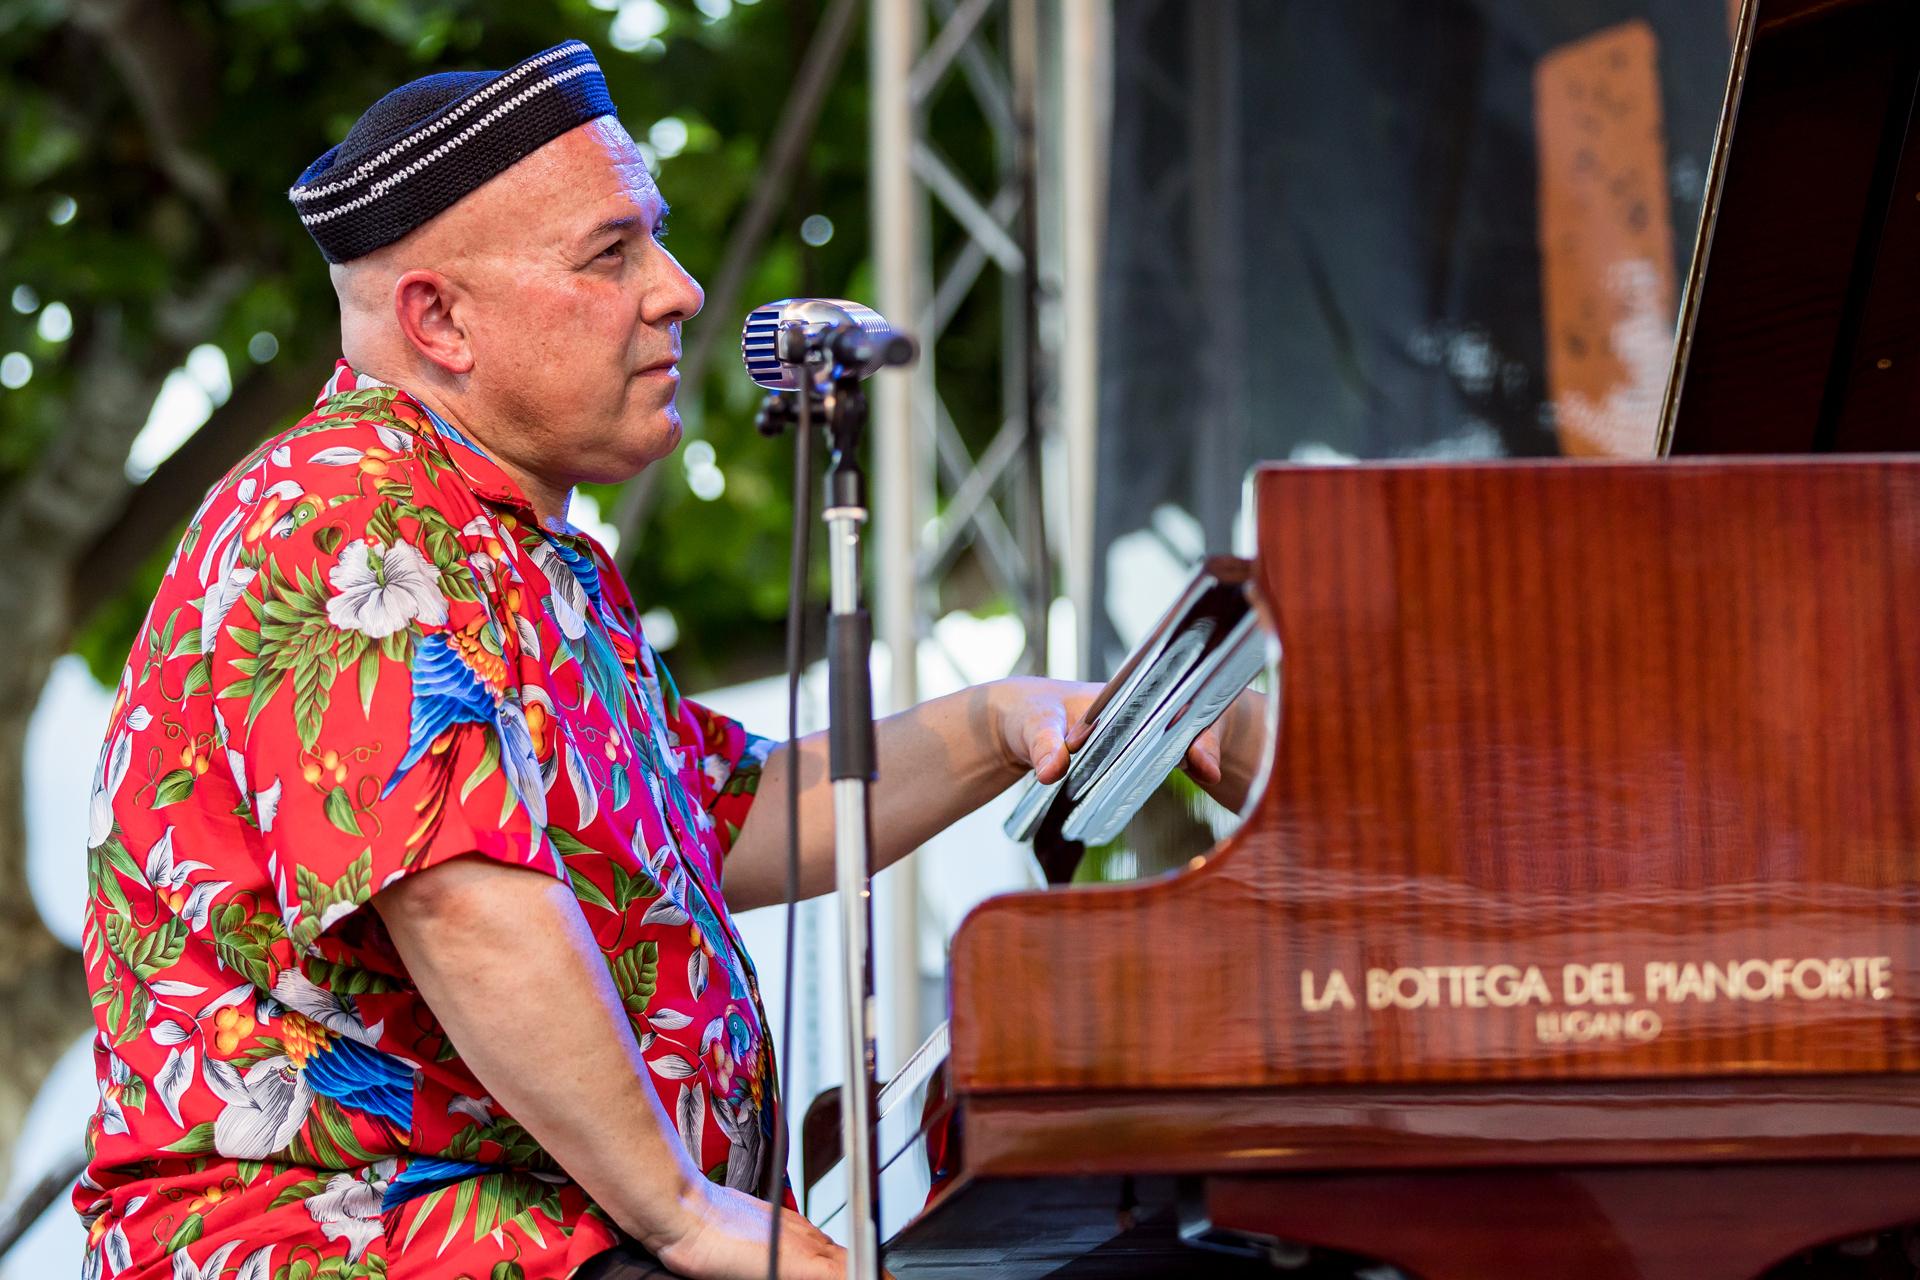 2019_06_27-Jazzascona-©-Luca-Vantusso-193719-EOSR5142